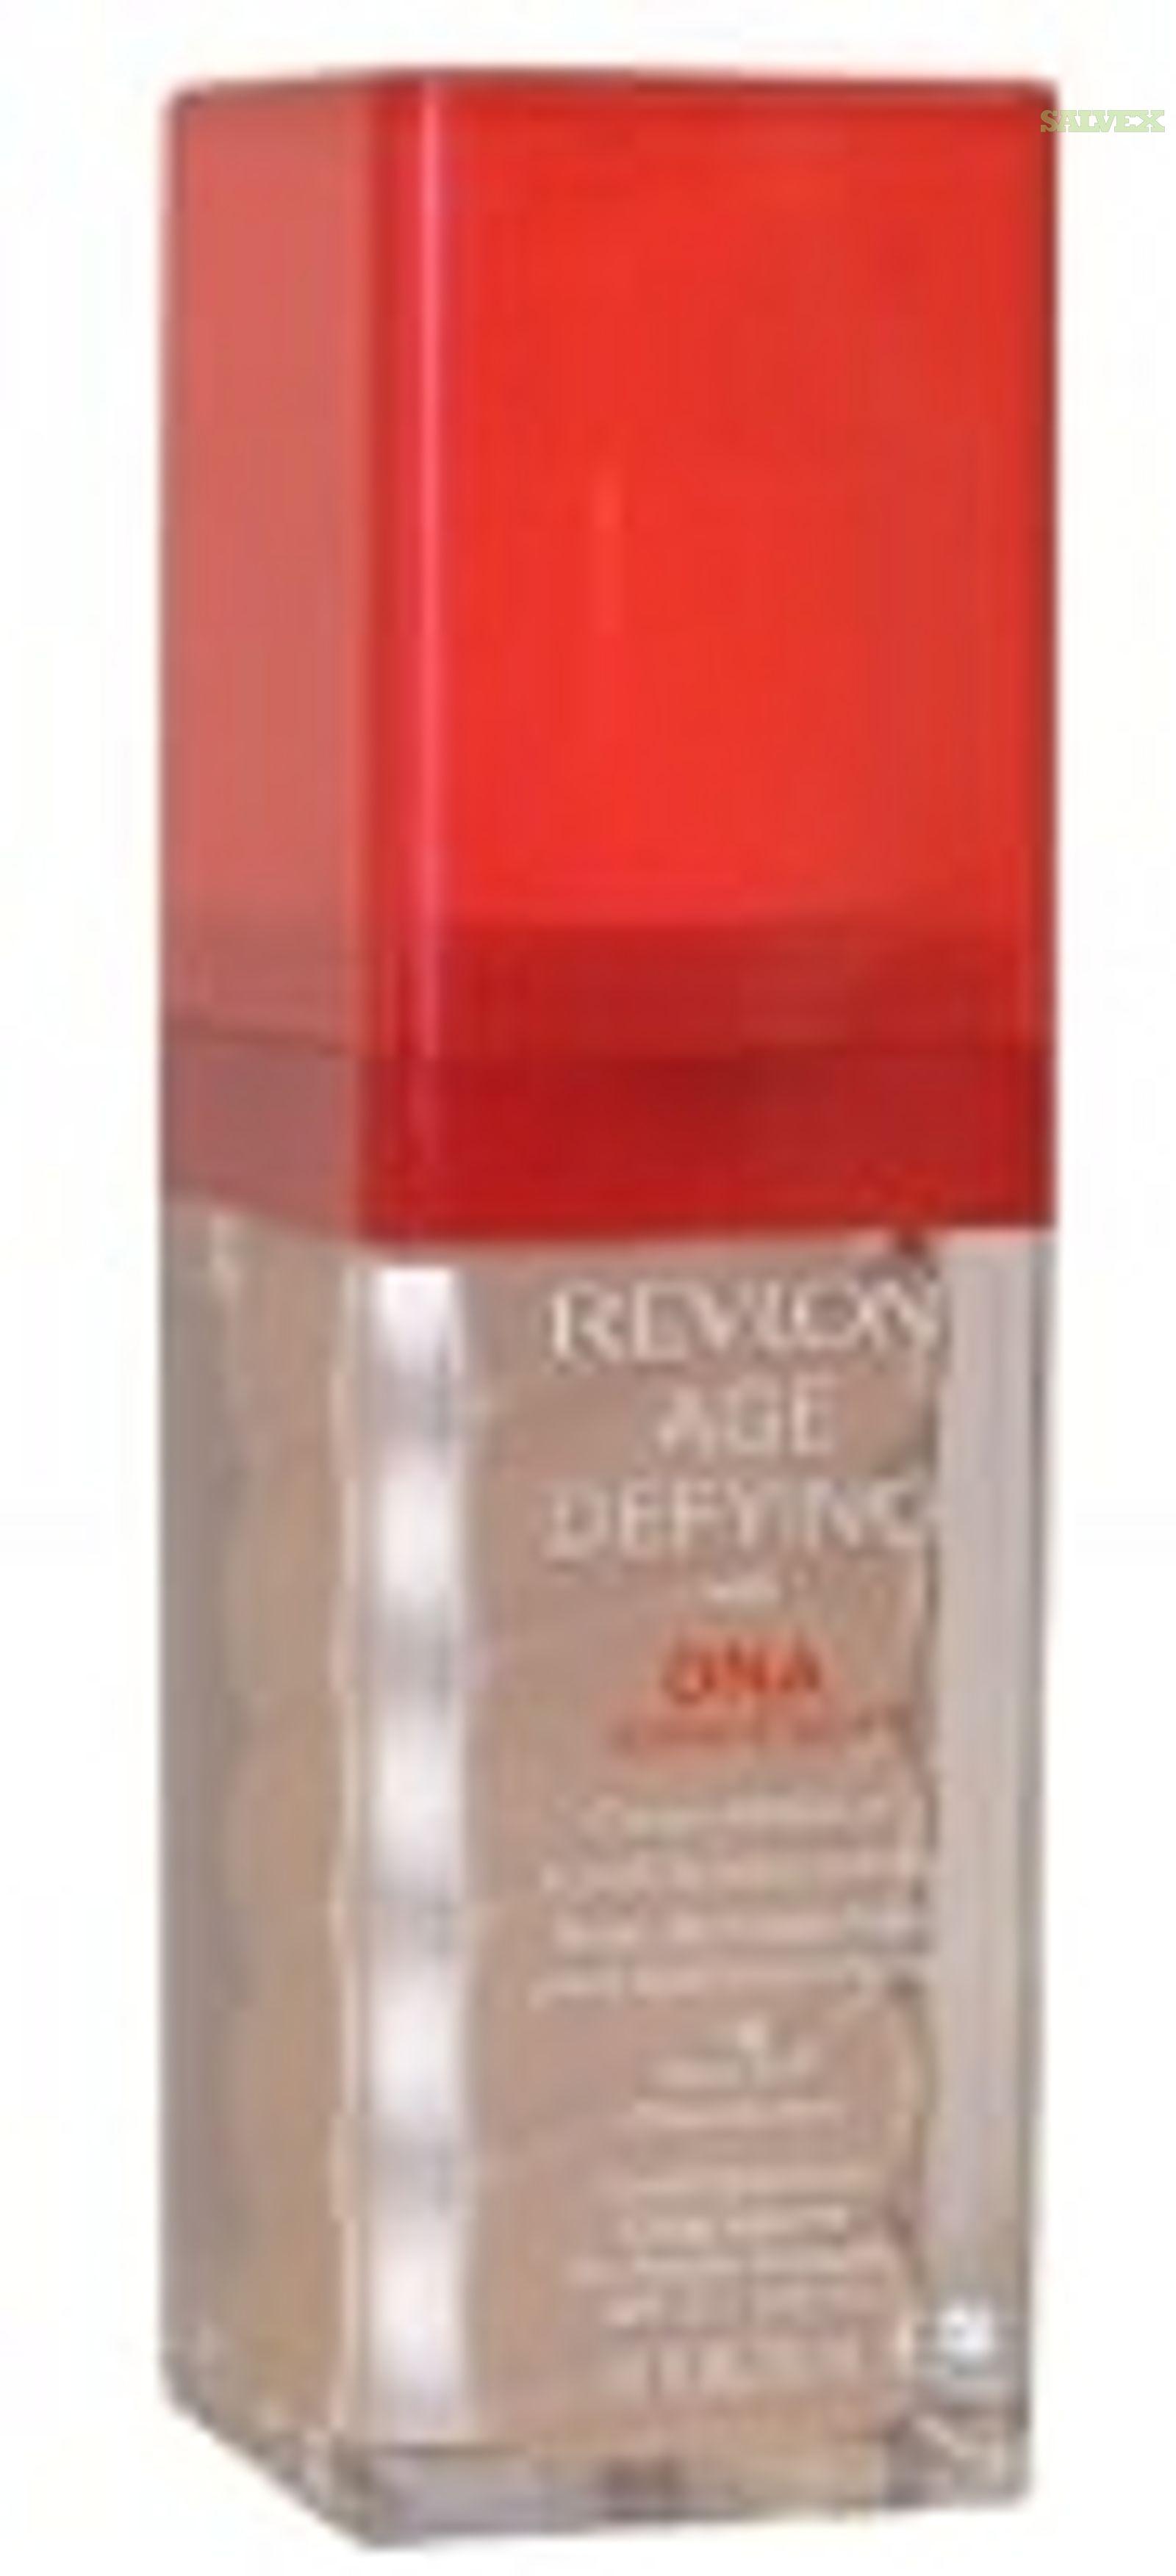 Revlon Beauty Products (Face, Lips, Foundation, etc.) - 734 Cartons